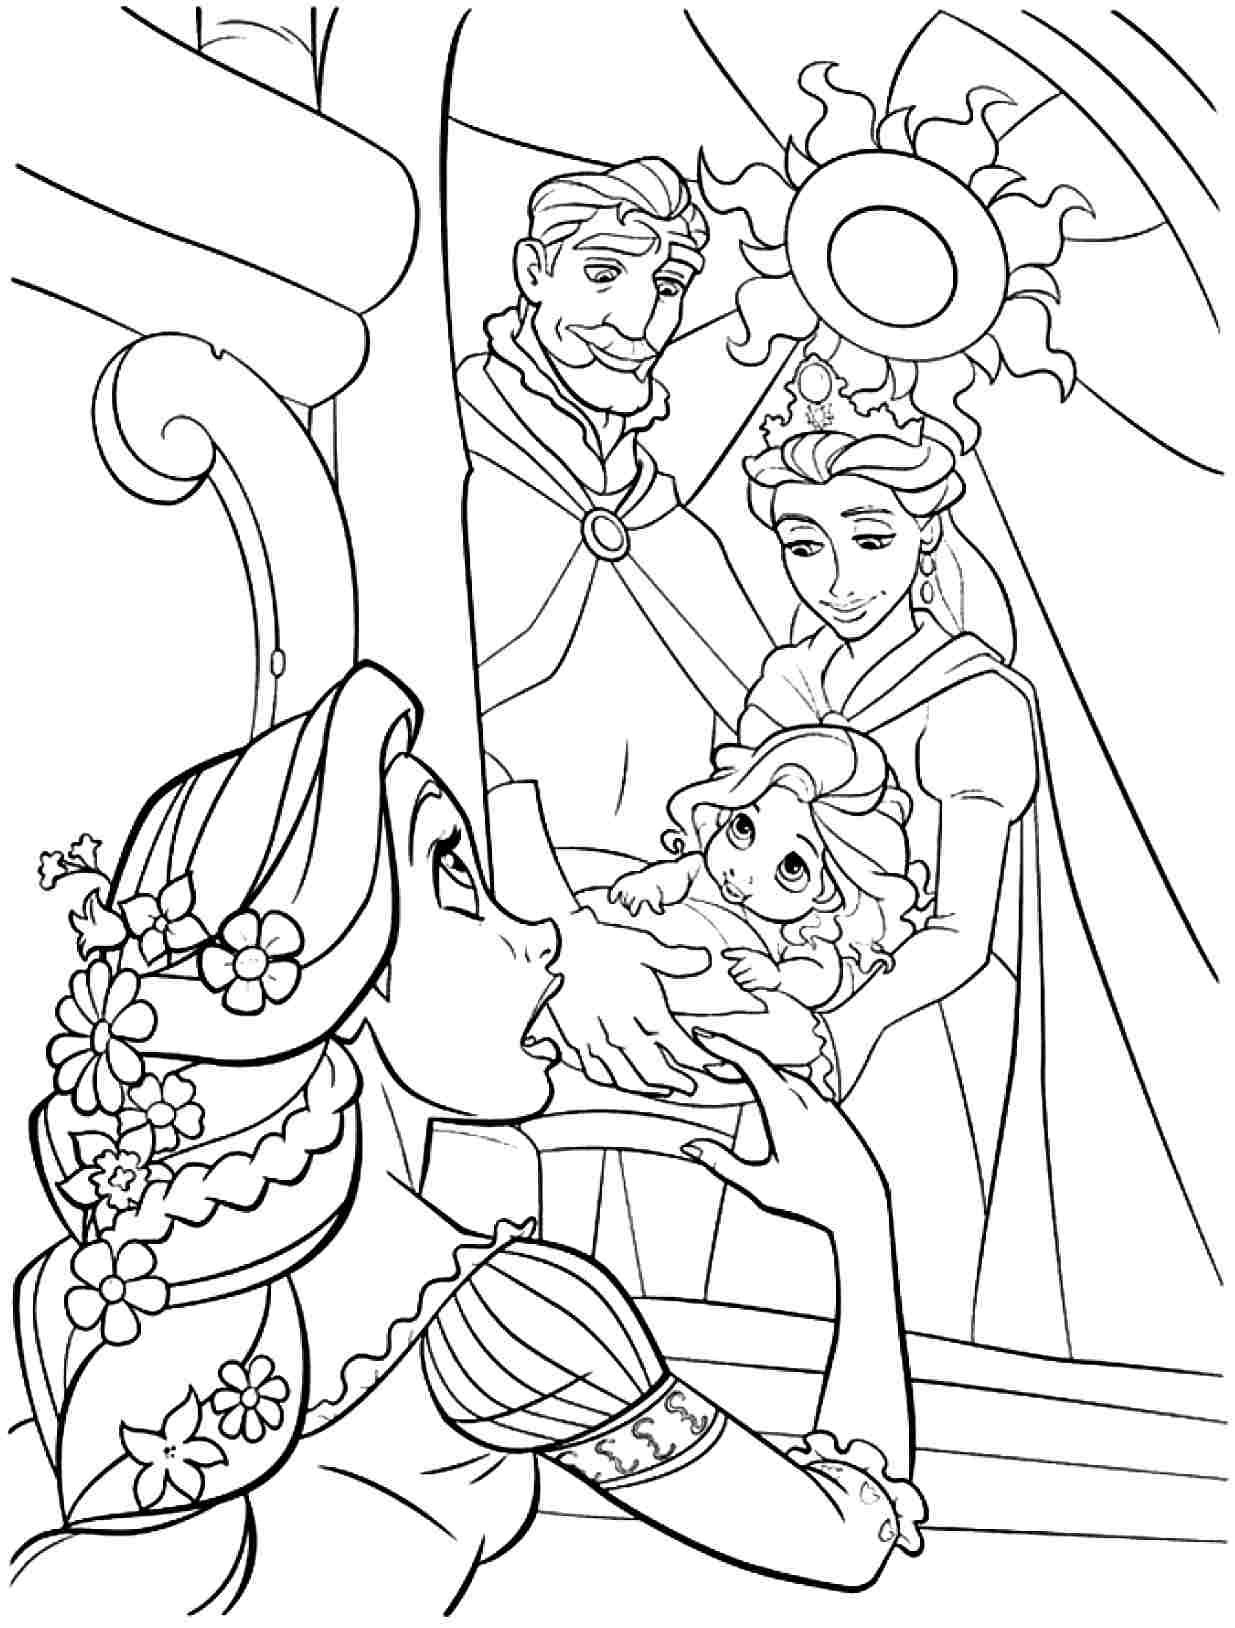 Printable Free Coloring Pages Disney Princess Tangled